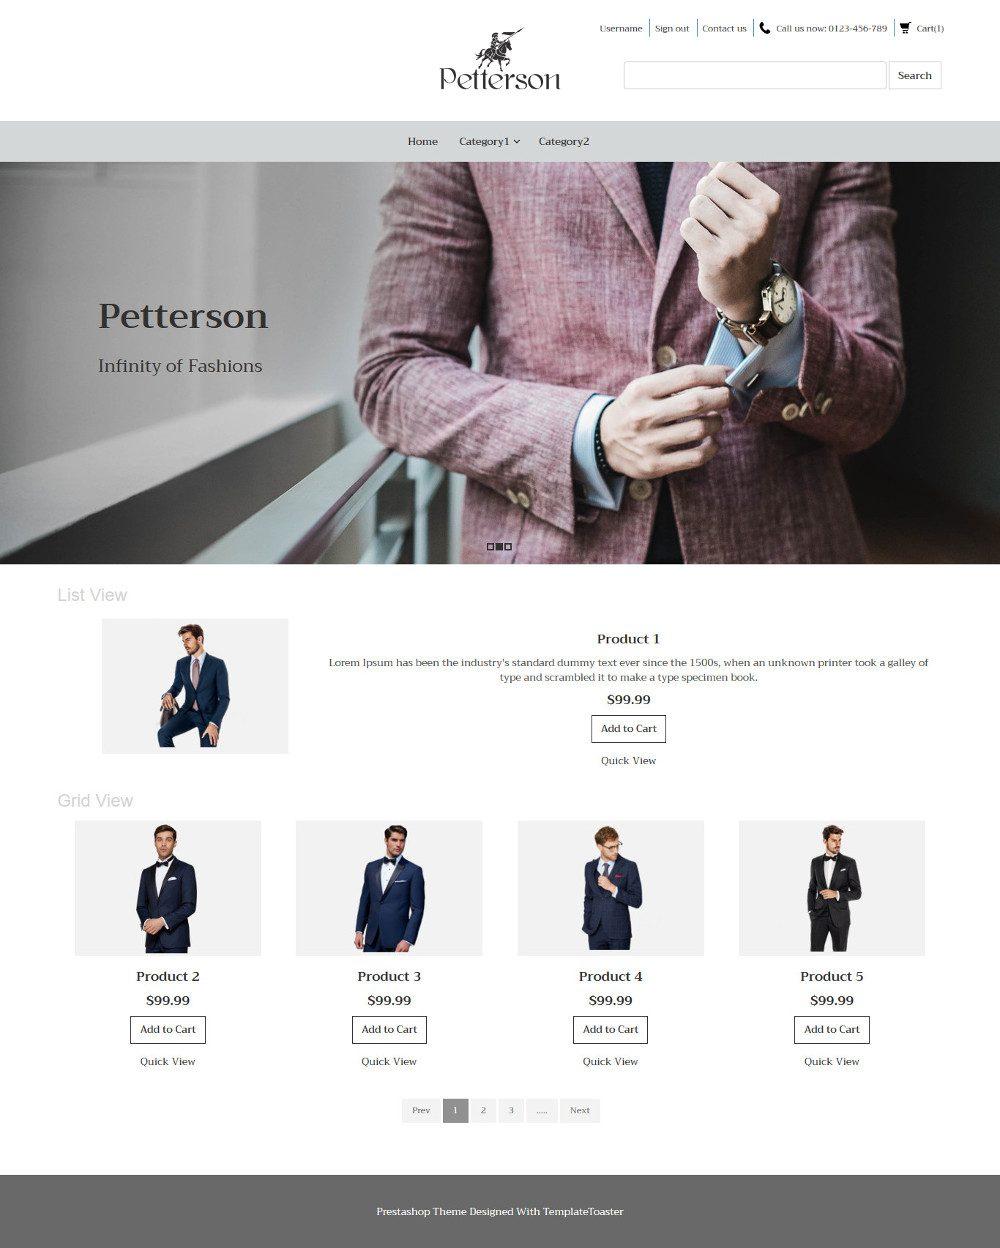 Pettersen Clothing Virtuemart Template